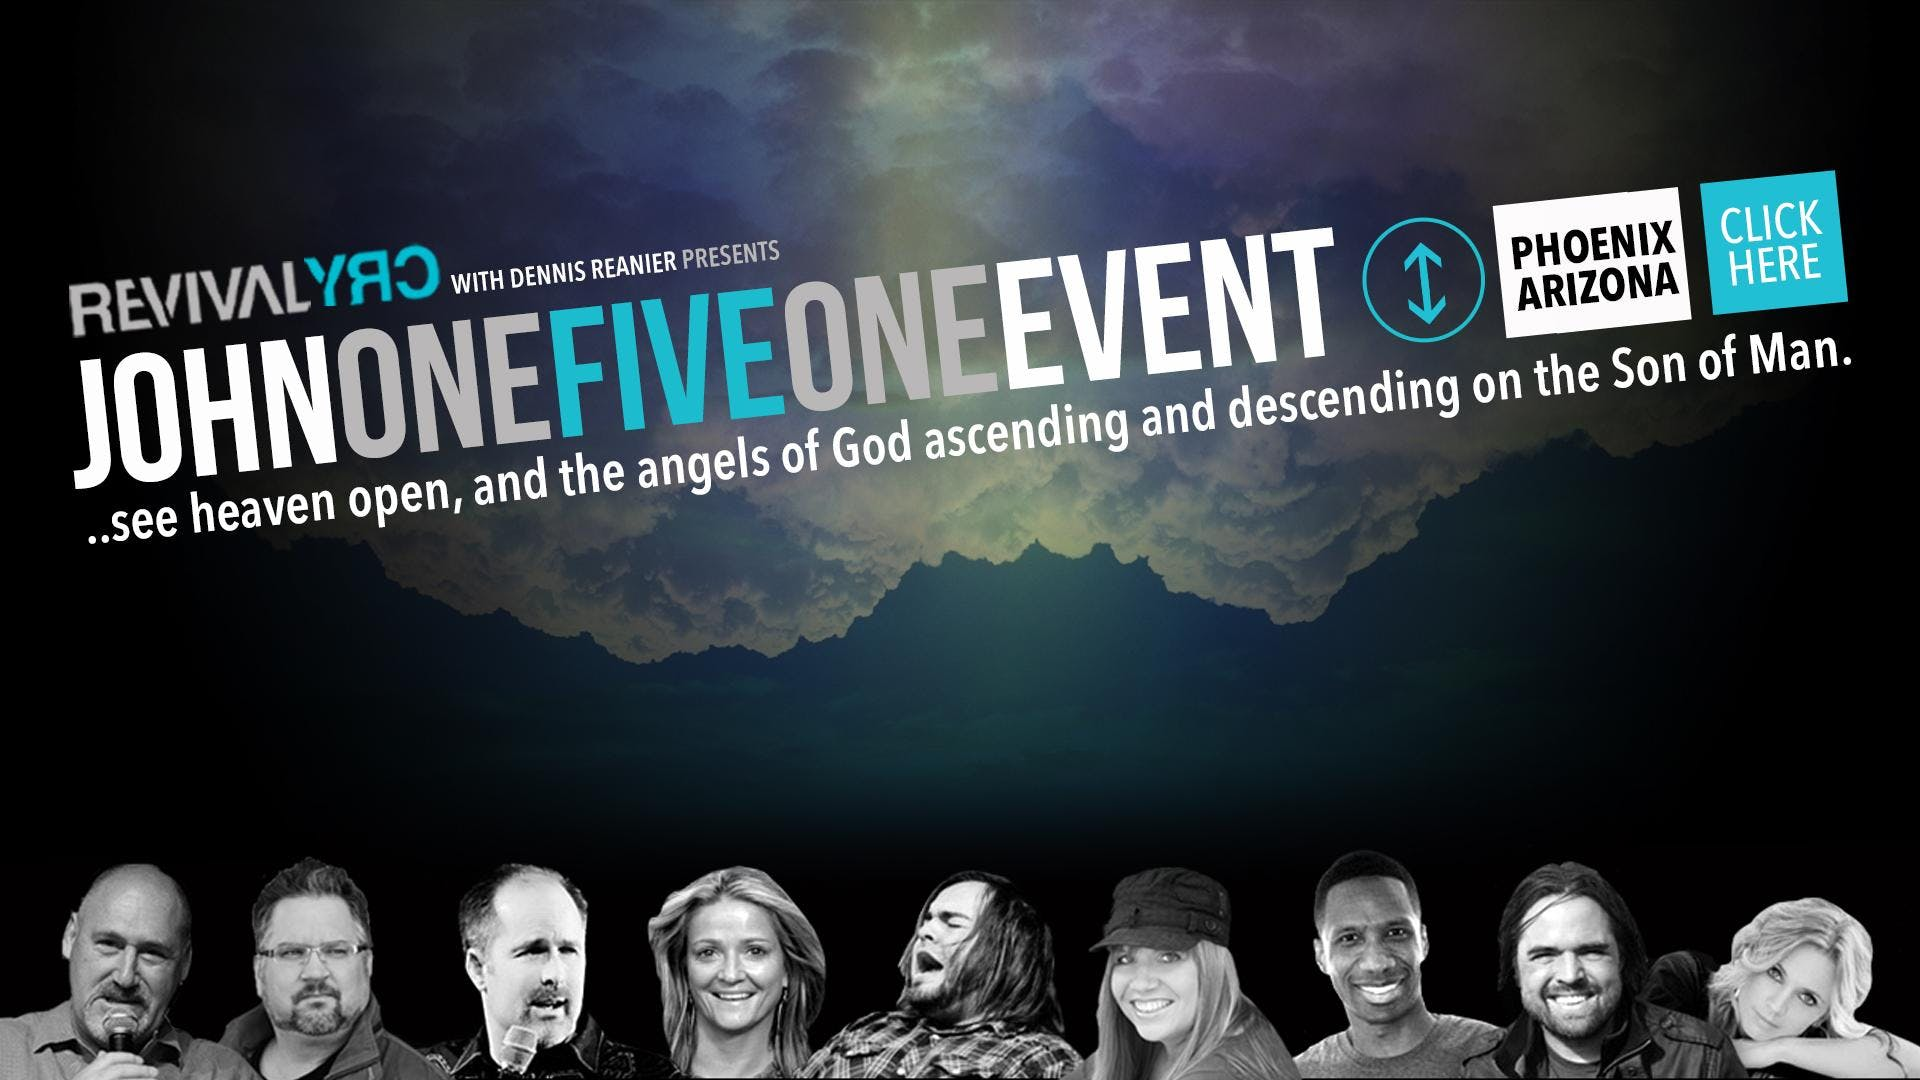 John 151 AZ. Jason Upton, Stacey & Wesley Campbell, Dennis Reanier, & More!